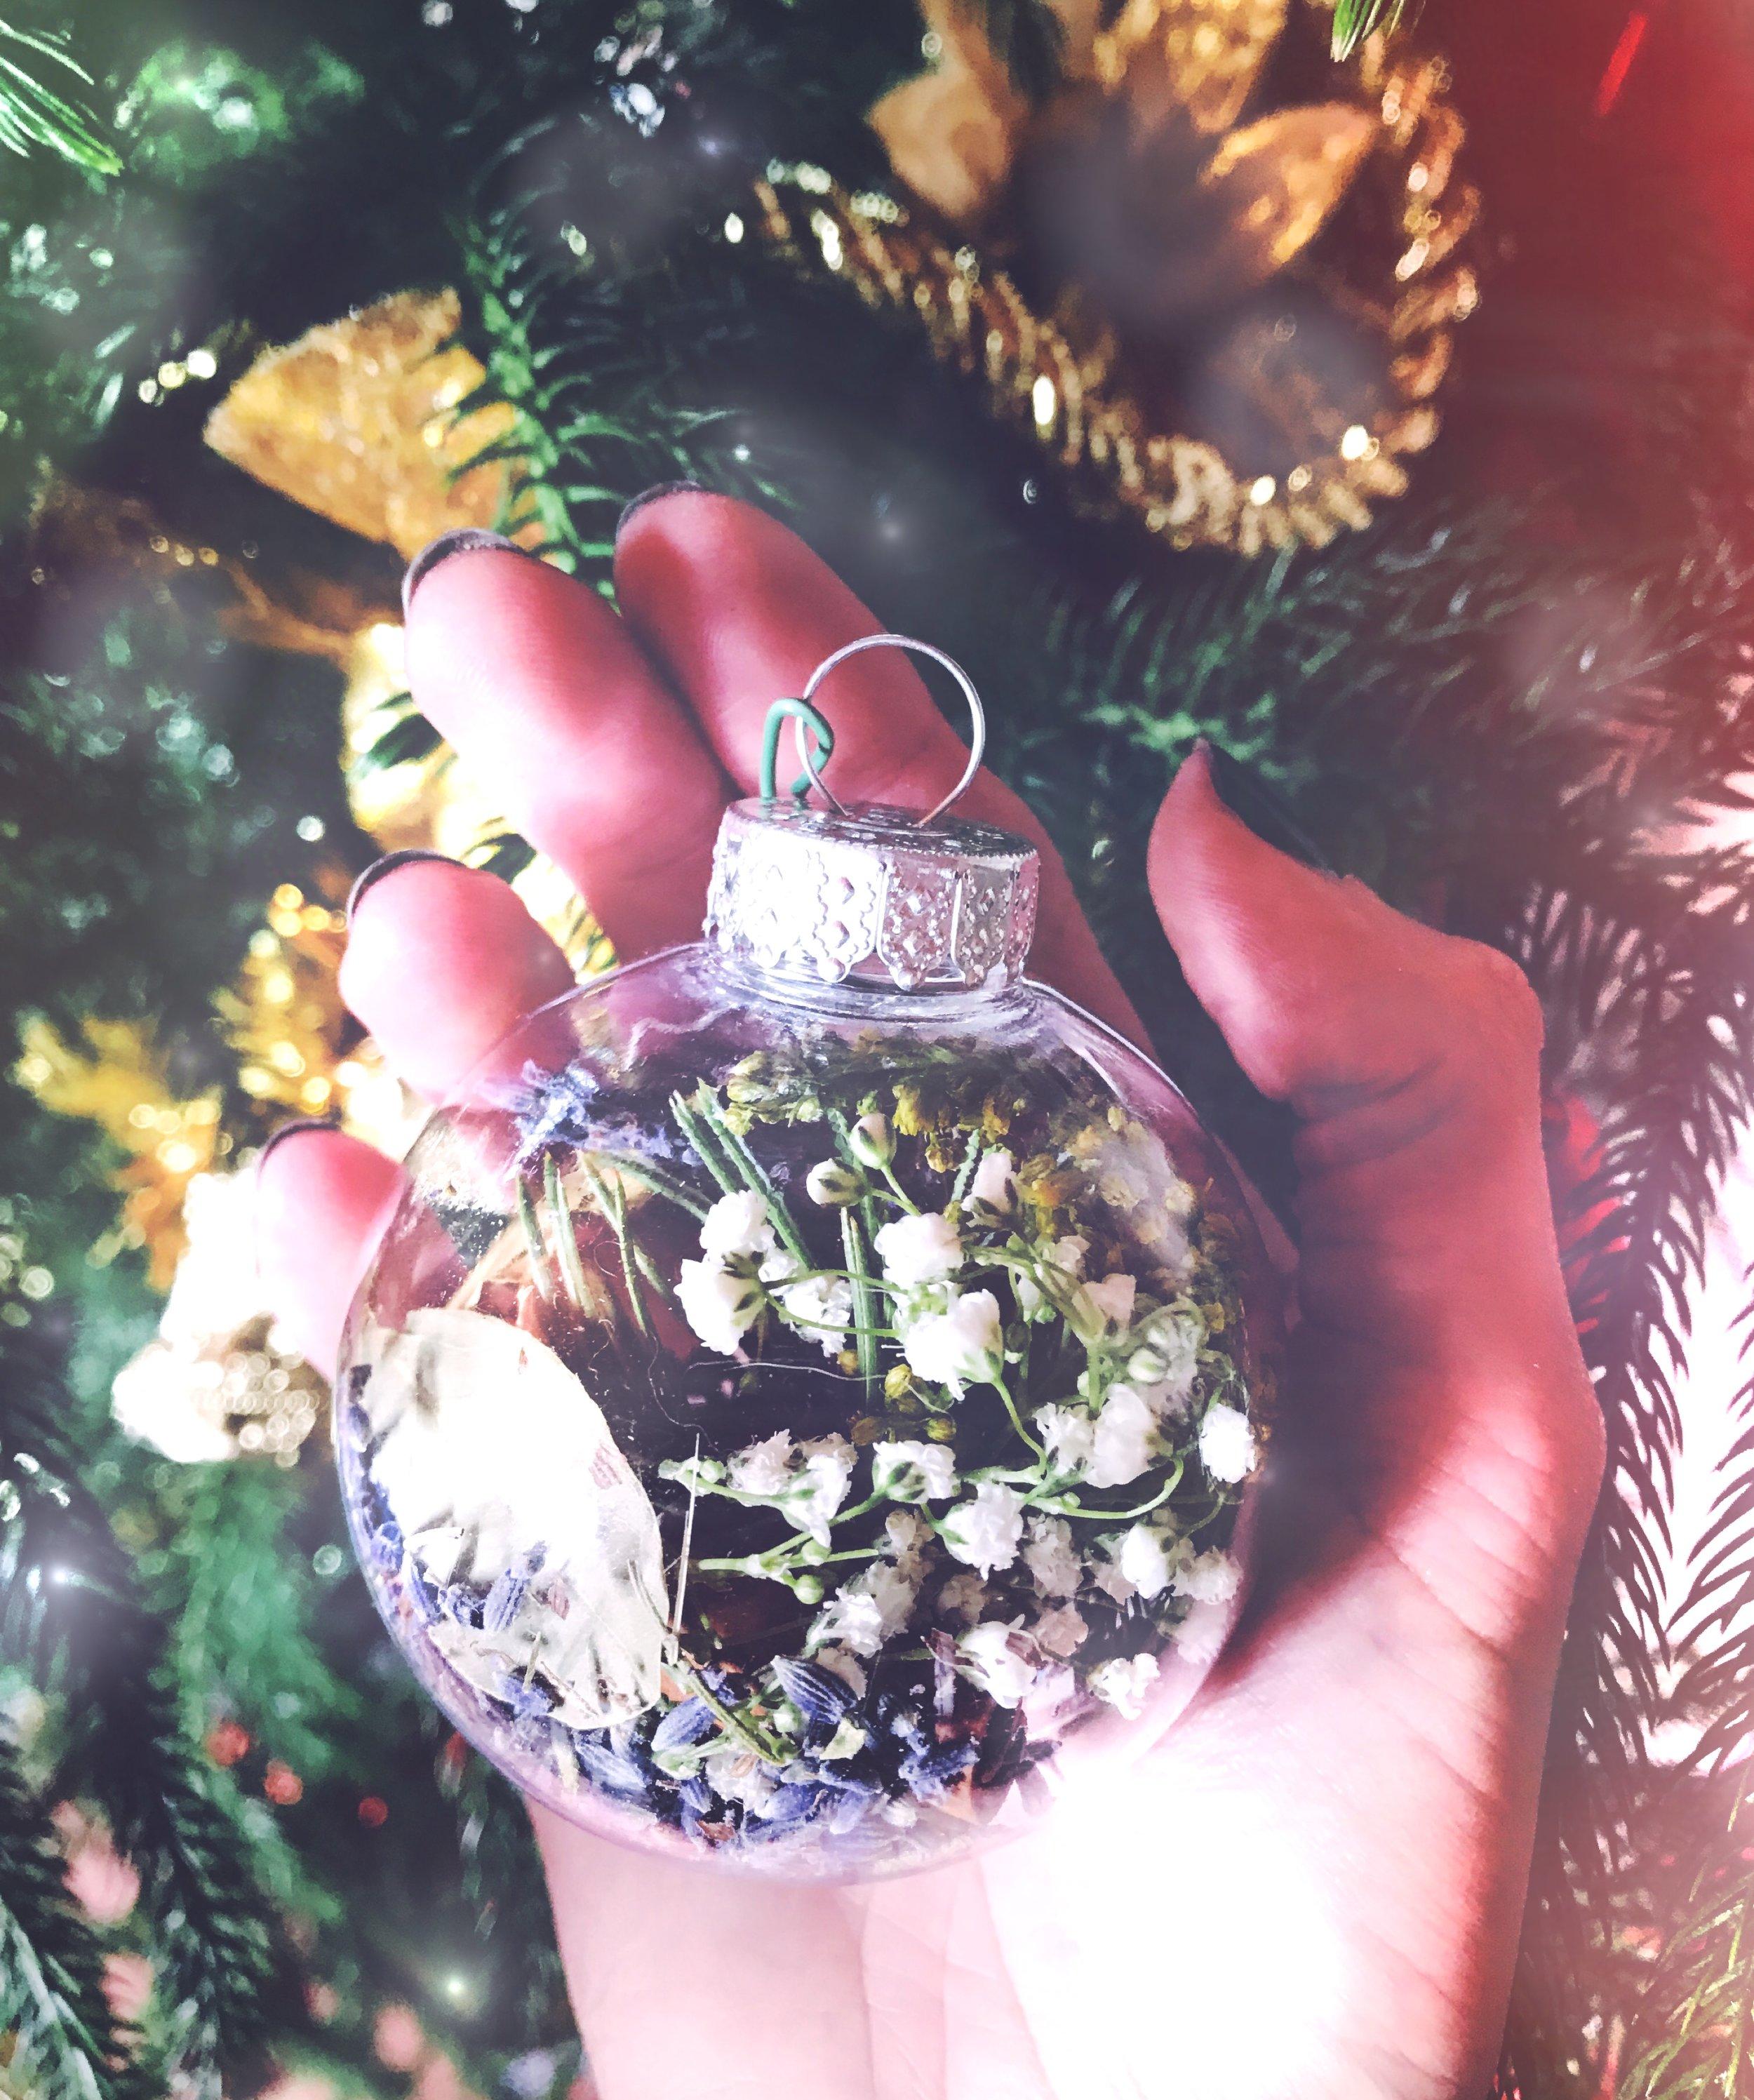 Witches Bauble Ornament for Yule Full Cold Moon | Spirit de la Lune